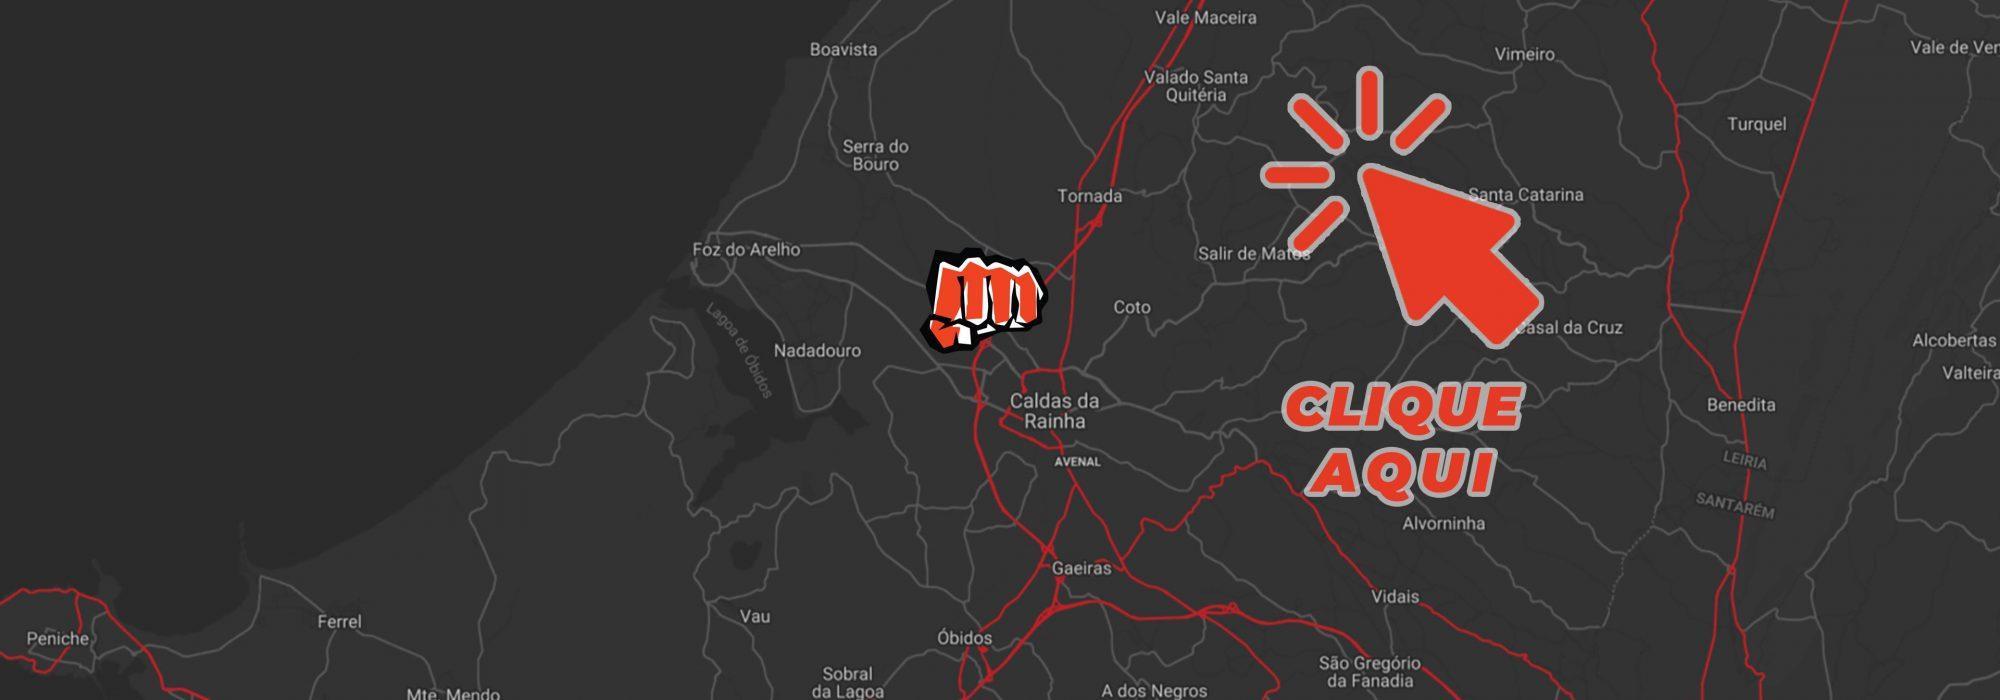 4k-map-caldas